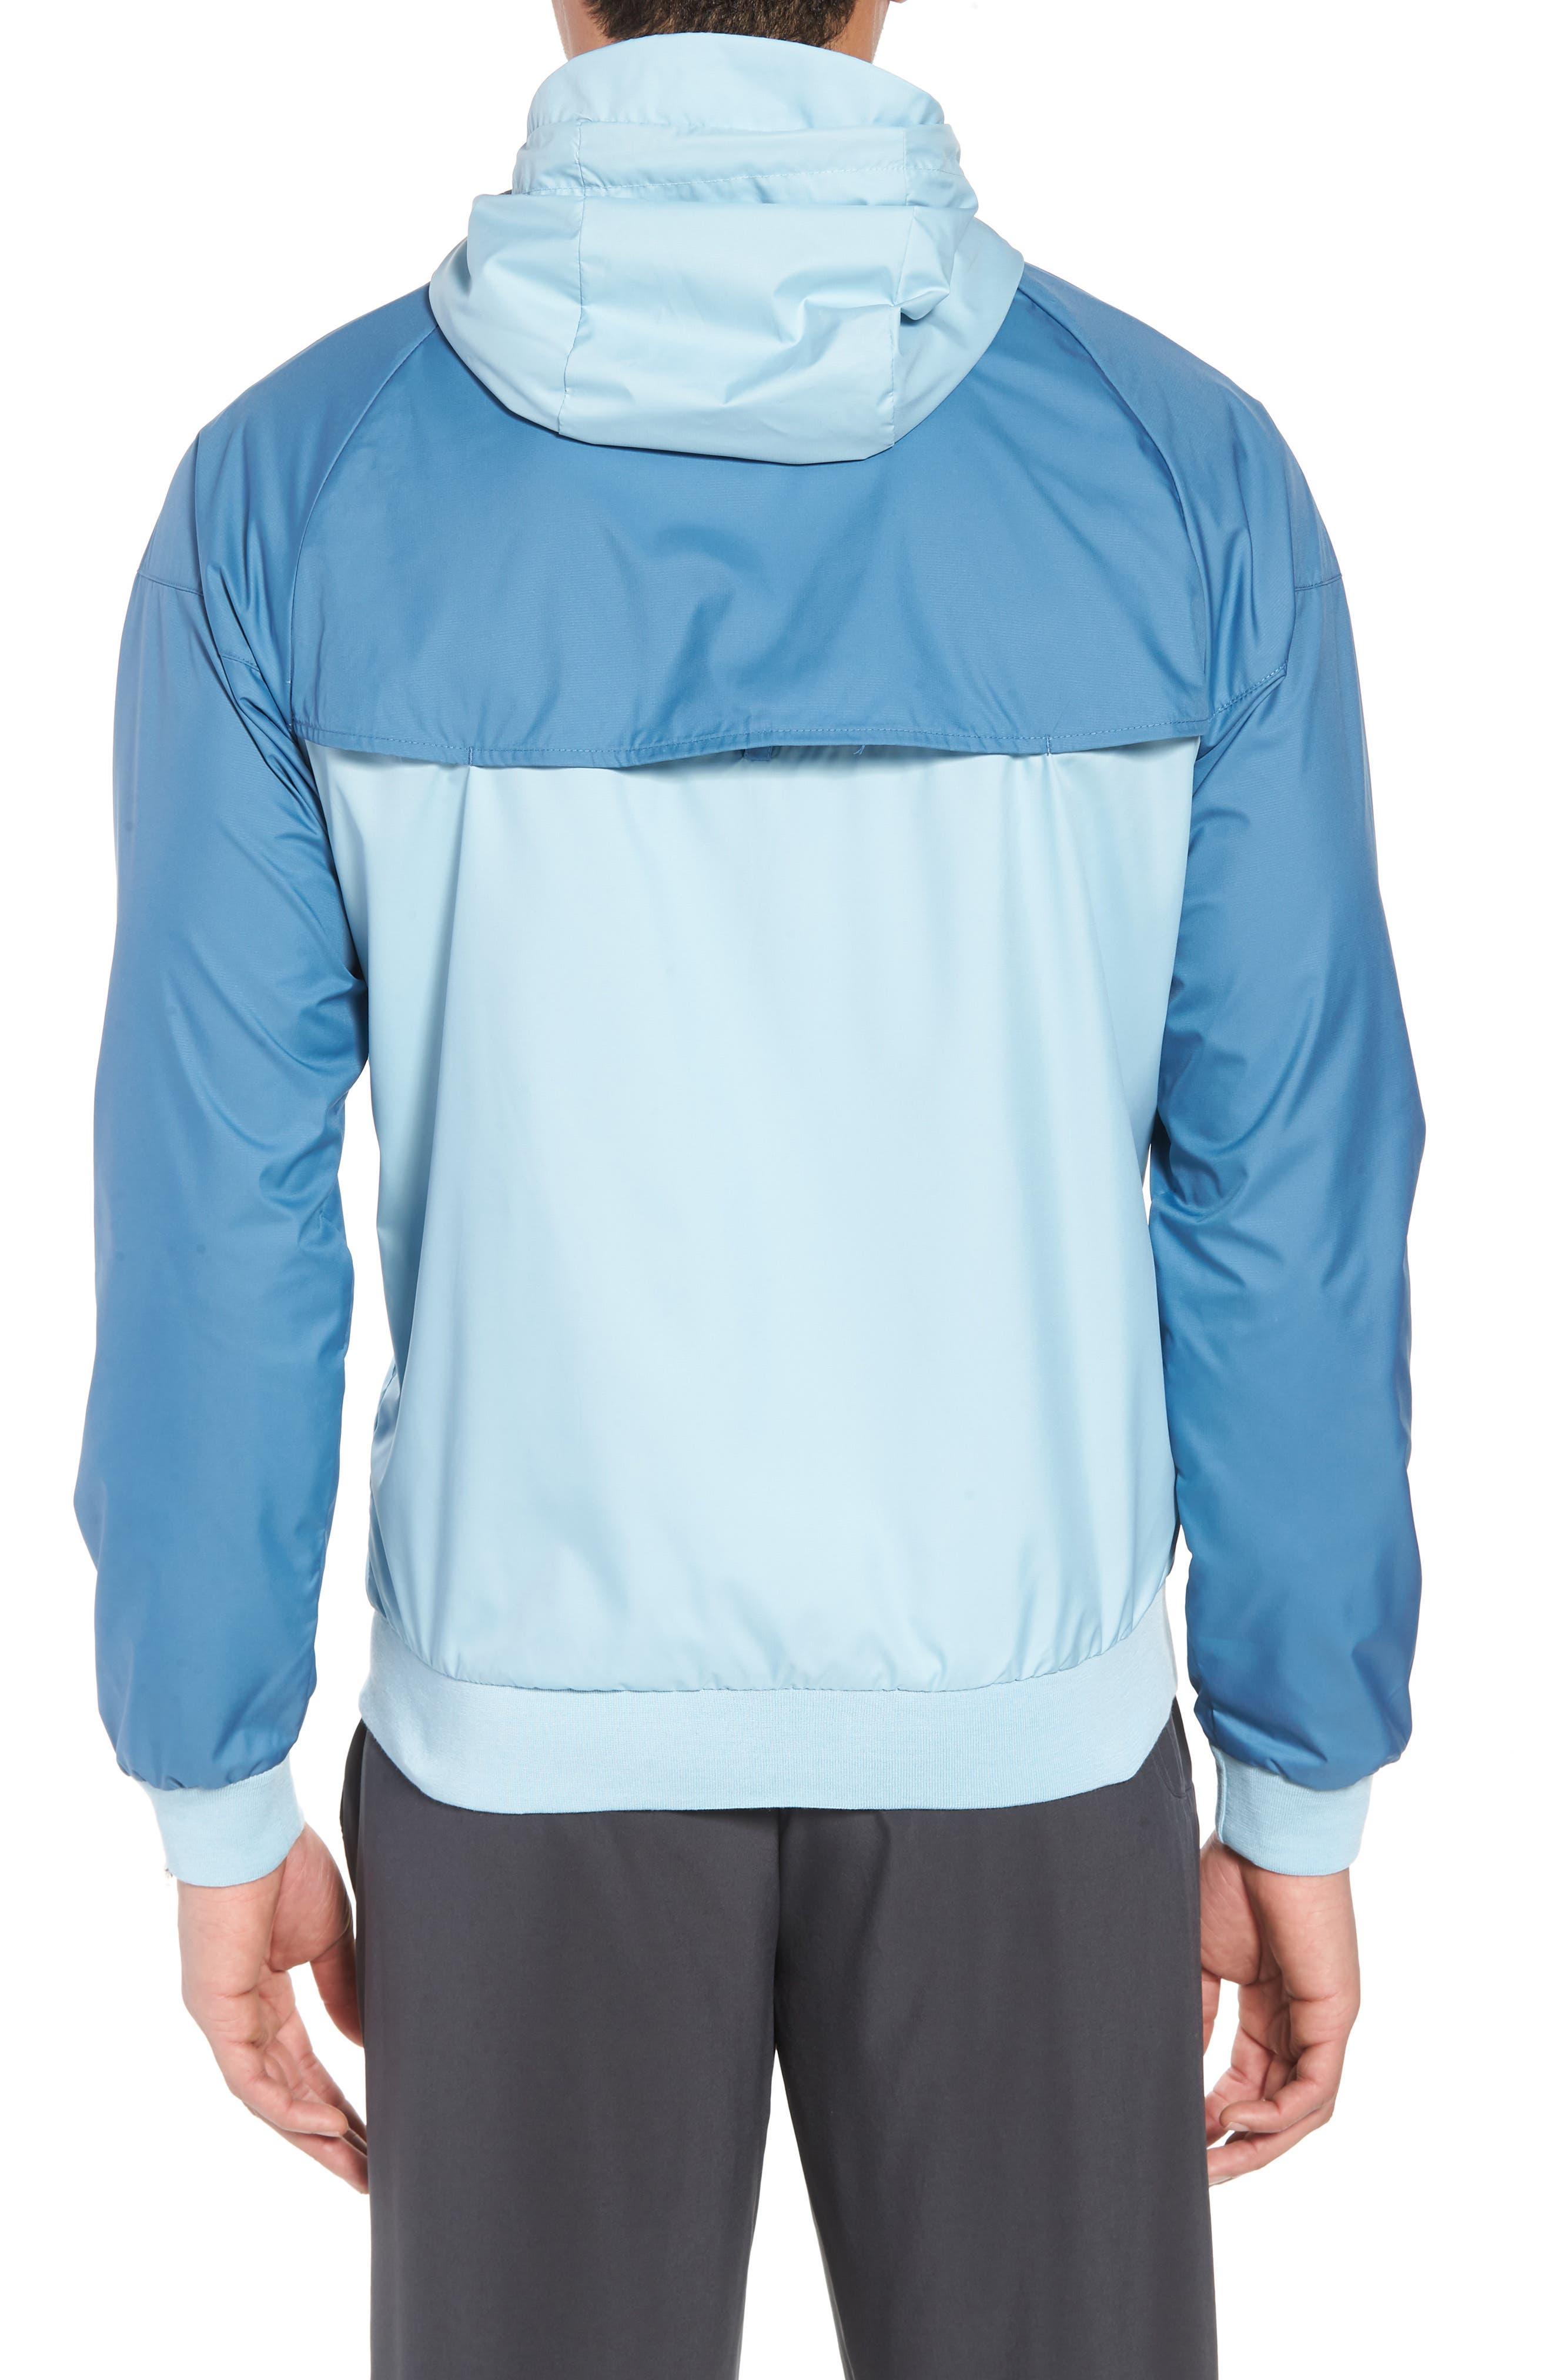 NIKE,                             Windrunner Colorblock Jacket,                             Alternate thumbnail 2, color,                             OCEAN BLISS/ AEGEAN STORM